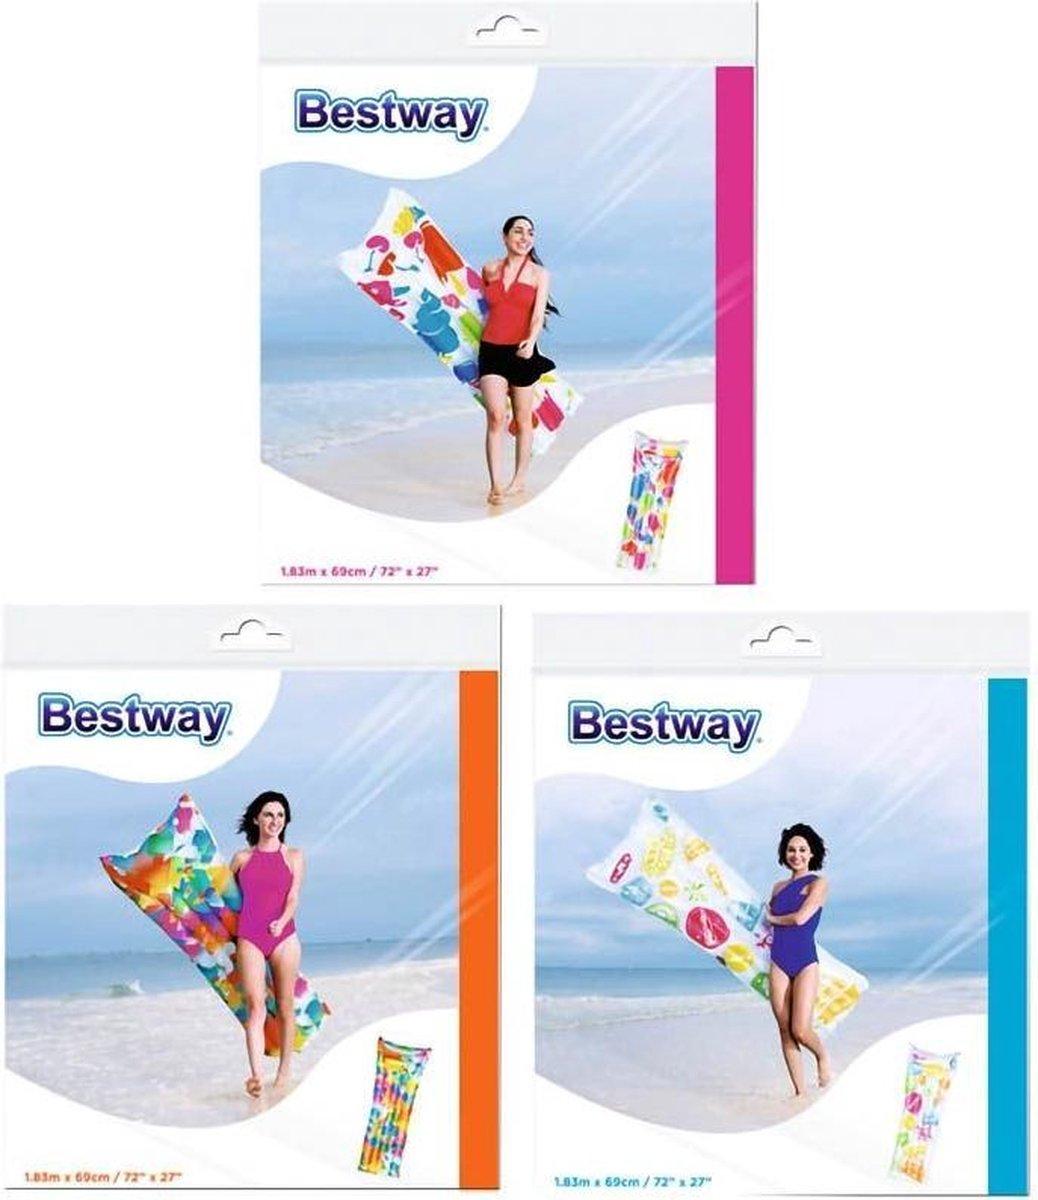 Bestway Luchtbed Ijsjes Multicolor 183 X 69 Cm